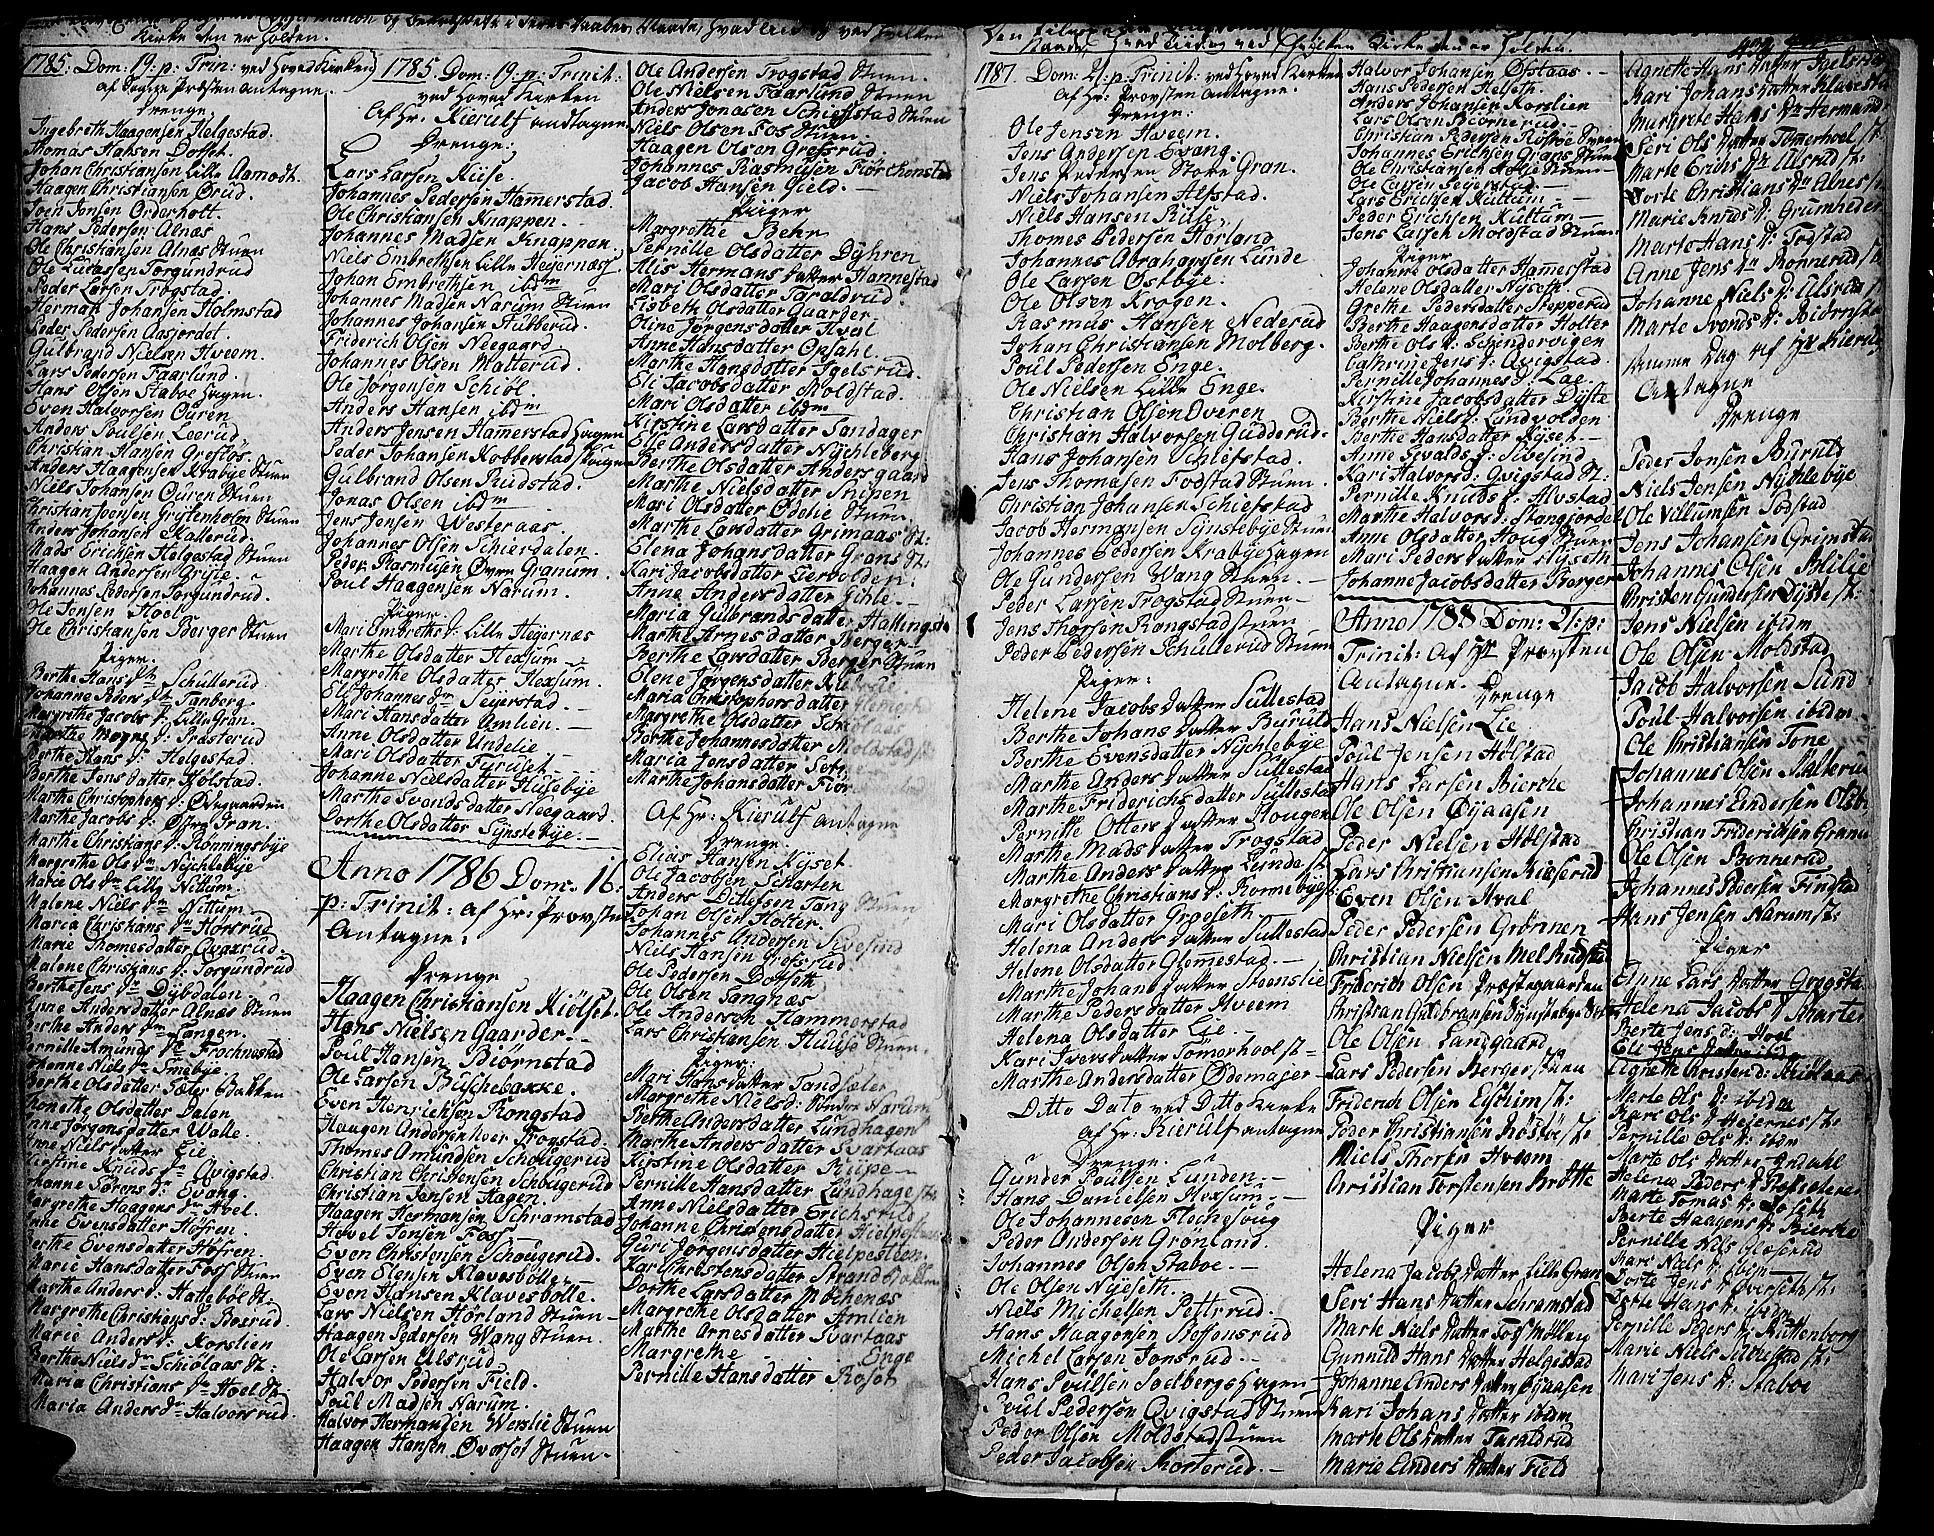 SAH, Toten prestekontor, Ministerialbok nr. 6, 1773-1793, s. 432